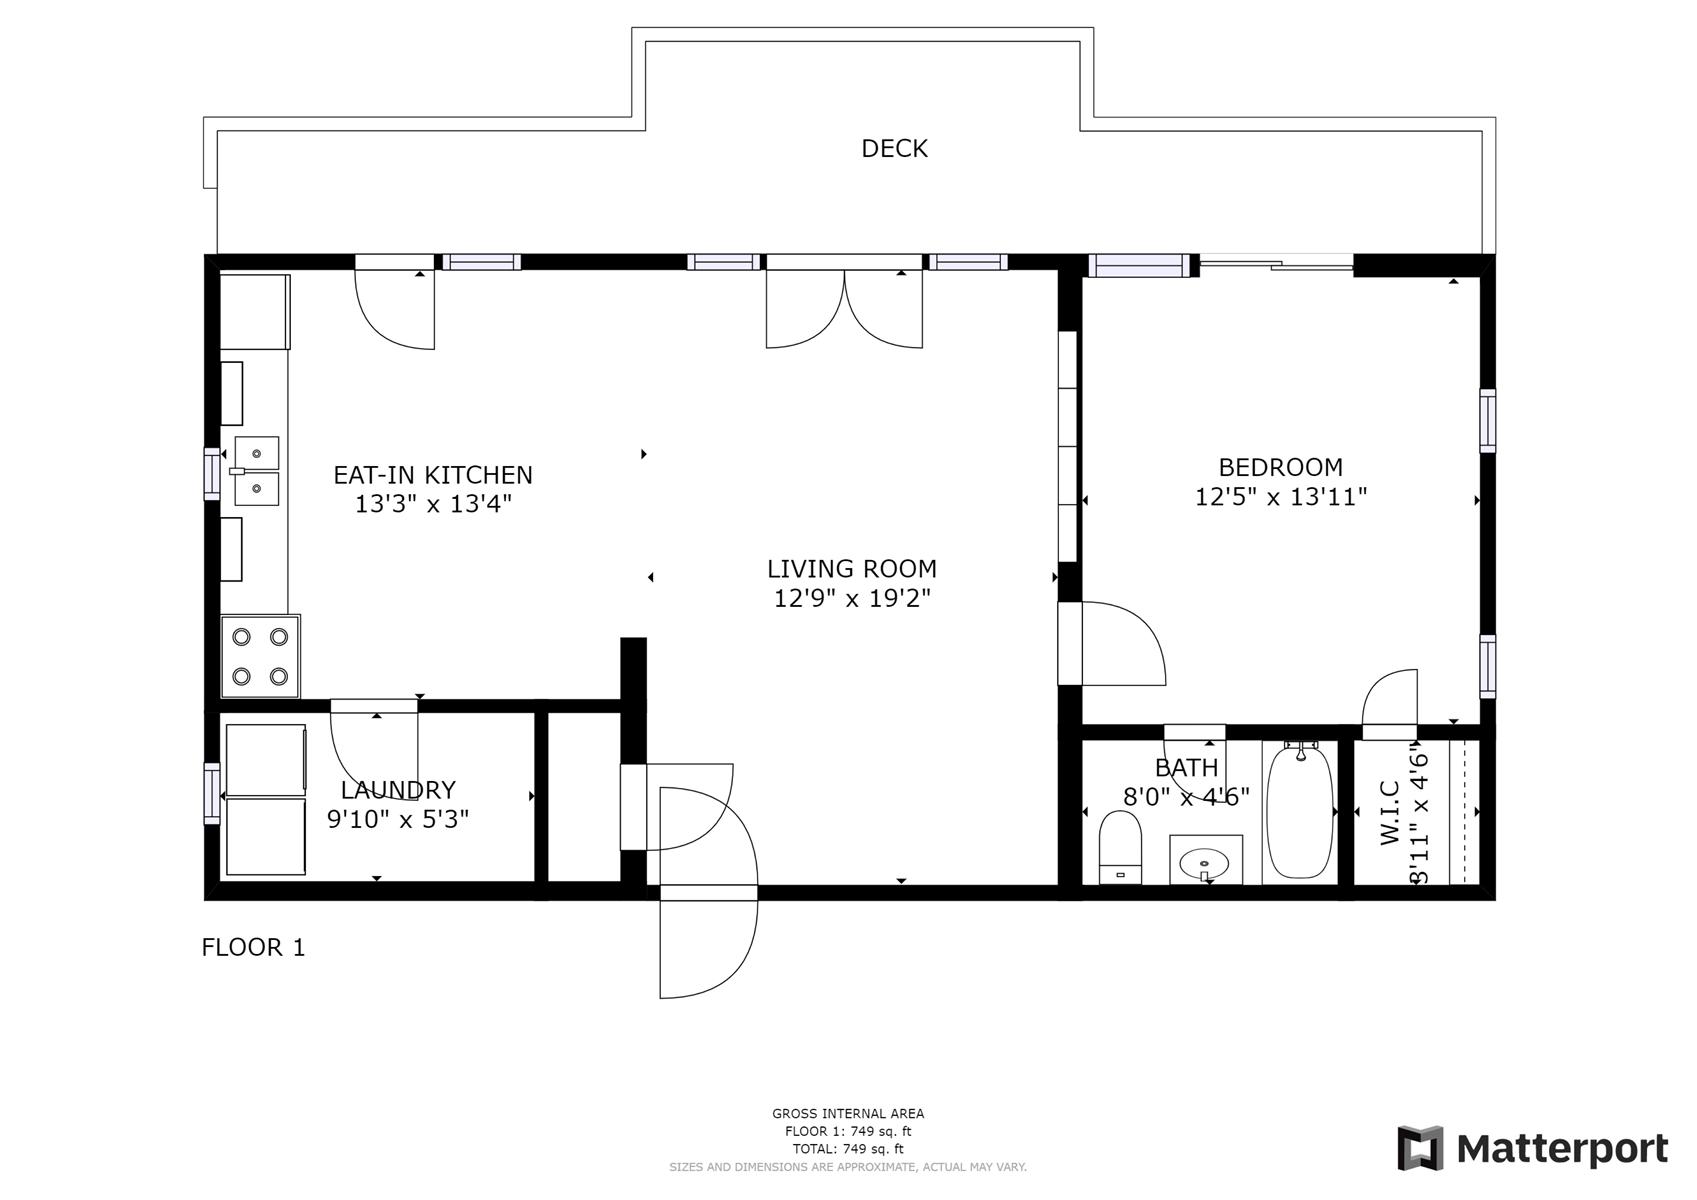 Floor Plan for Barn Cabin at Deerwoode Reserve